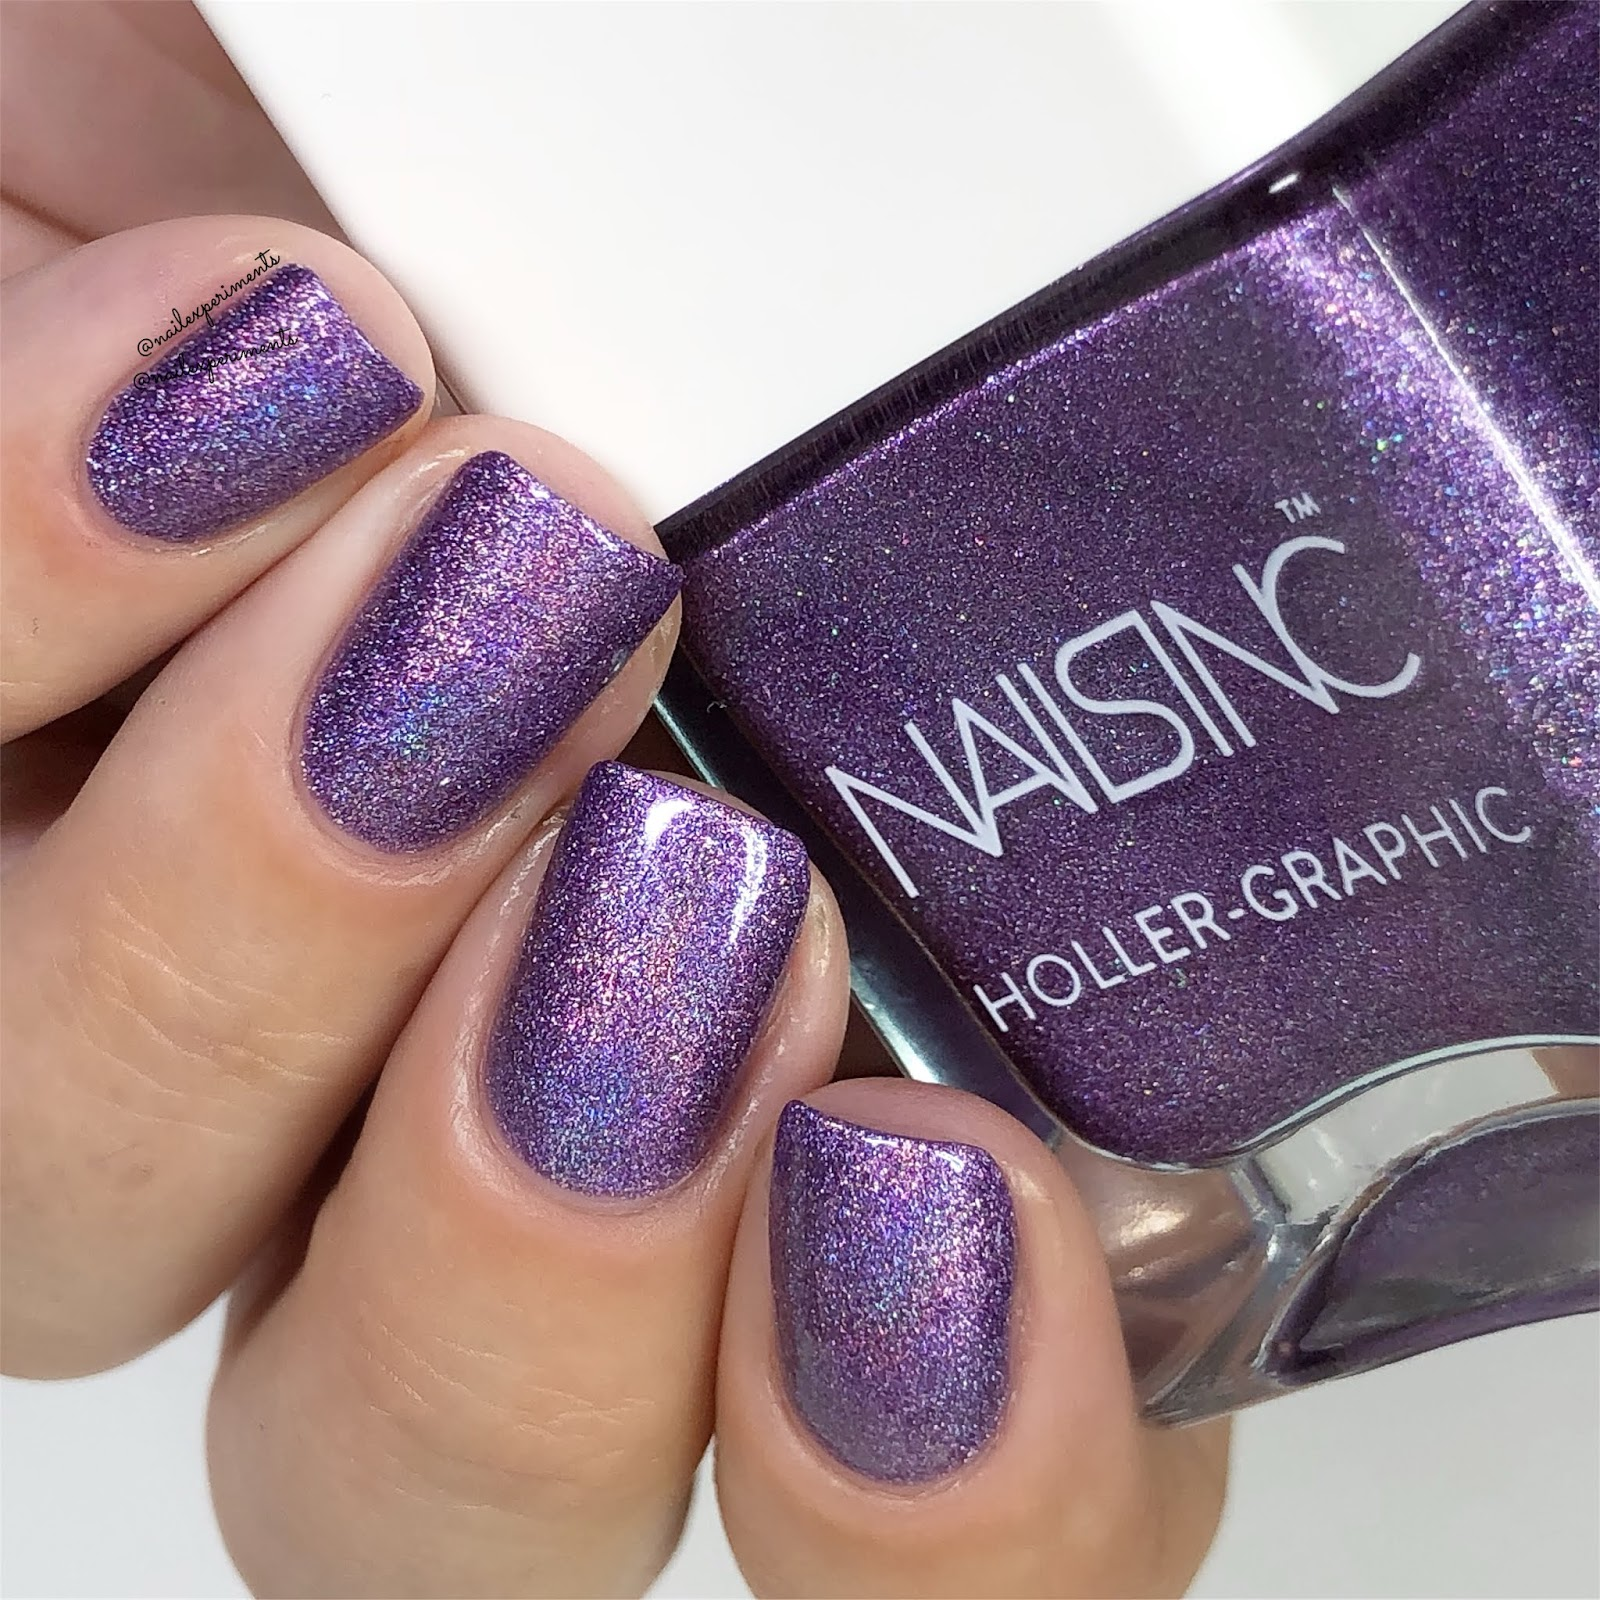 Nail Experiments: Nails Inc Holler-Graphic Spring 2018